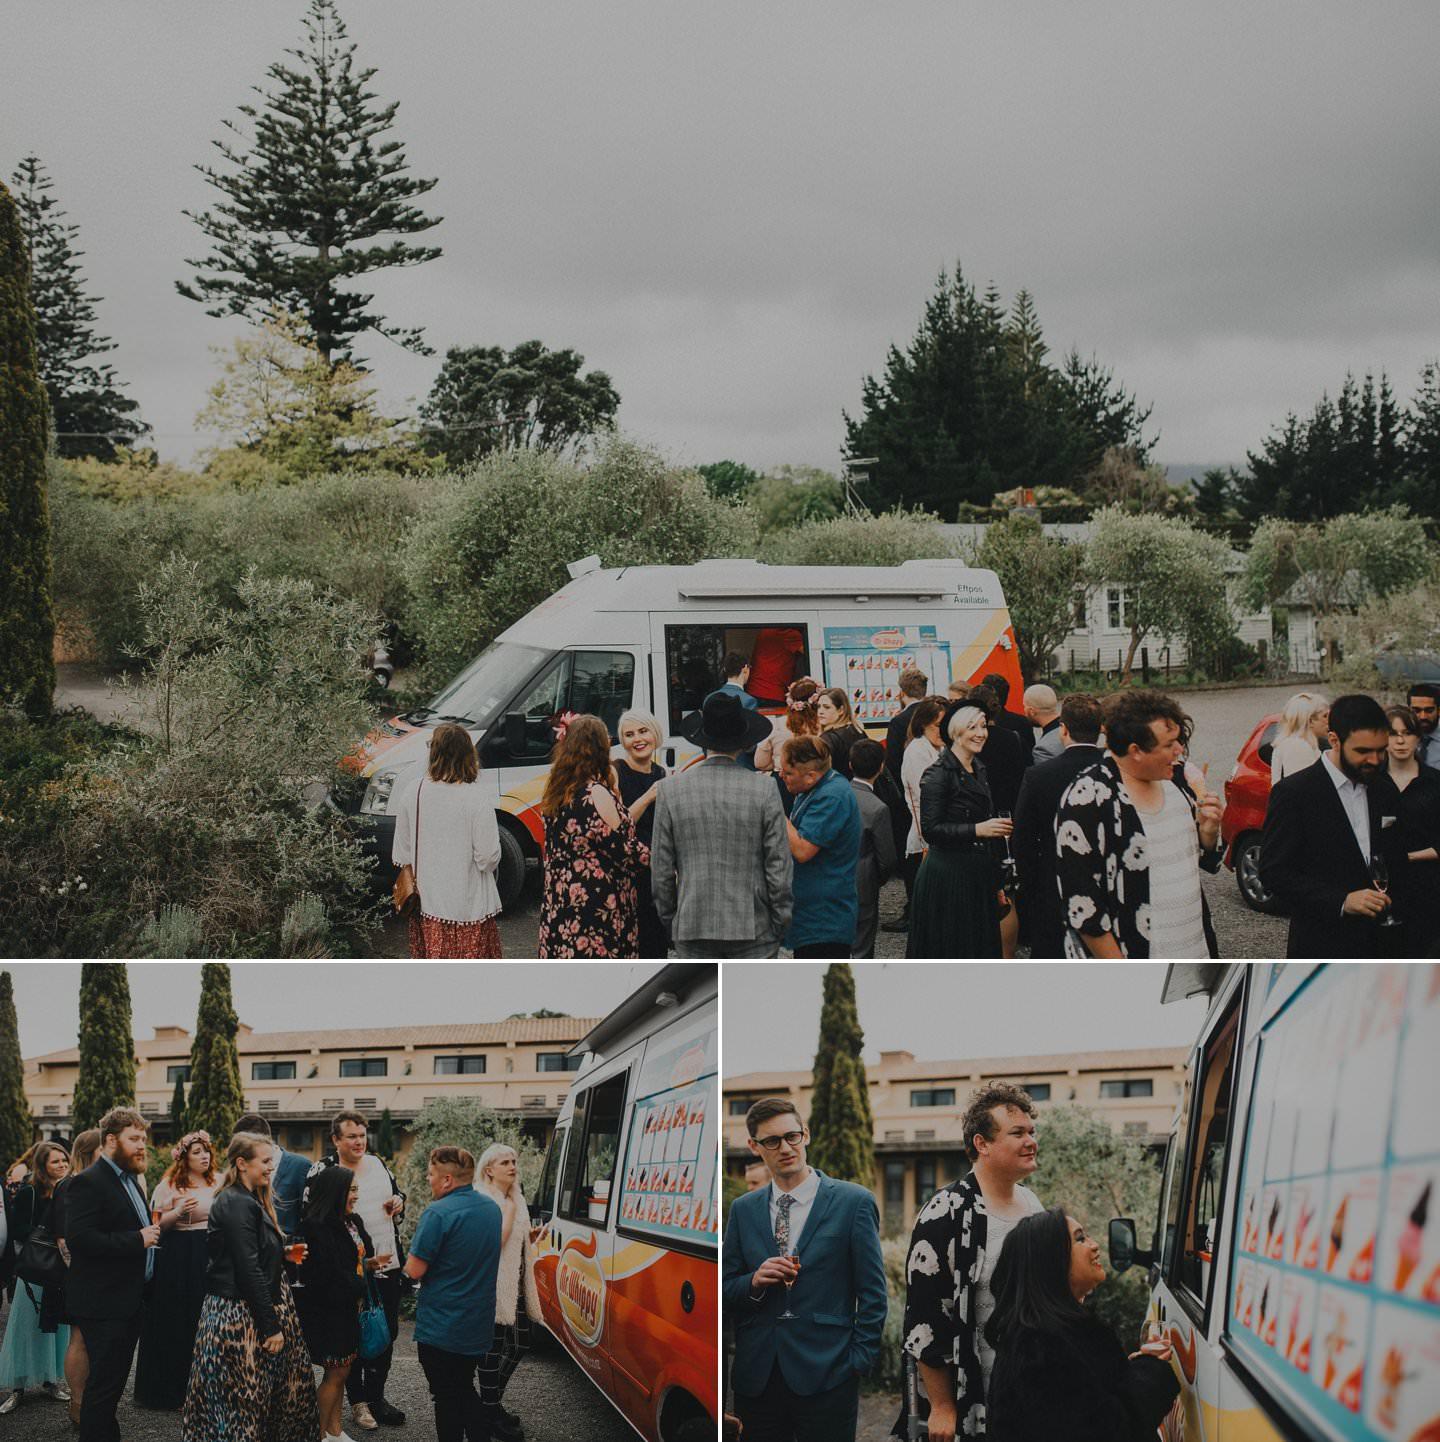 Mr Whippy ice cream truck at wedding